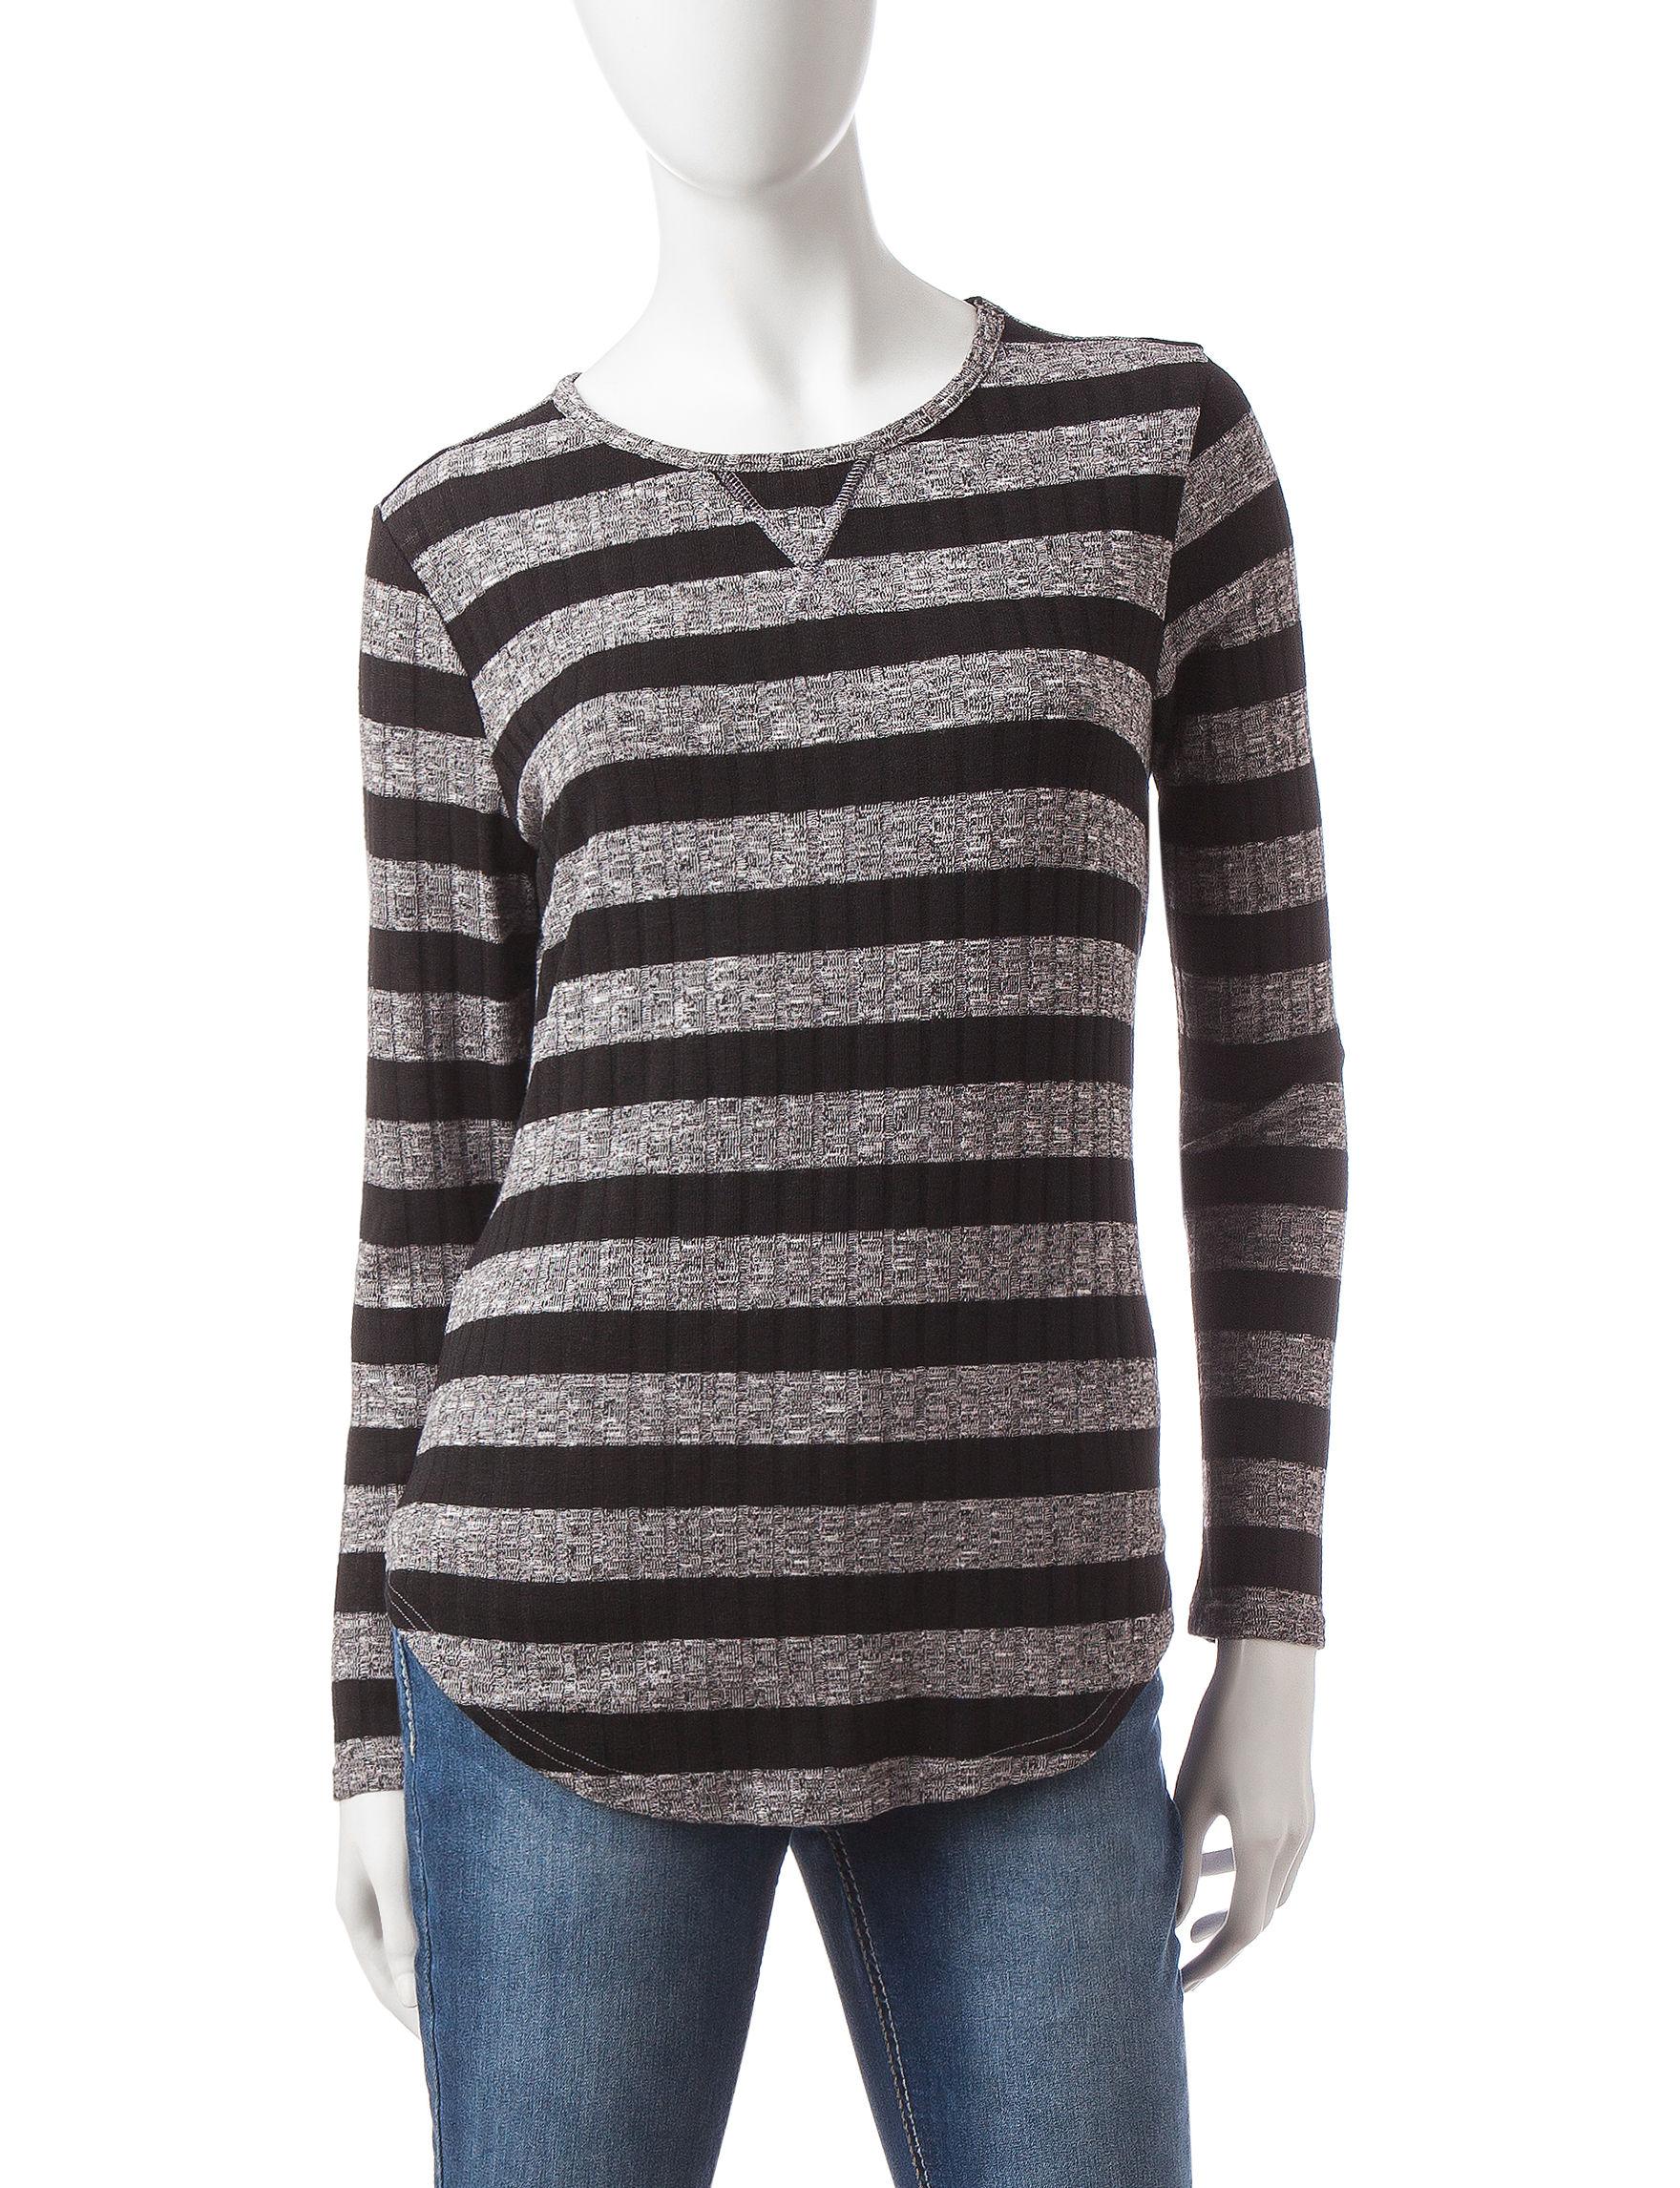 Rebecca Malone Grey / Black Shirts & Blouses